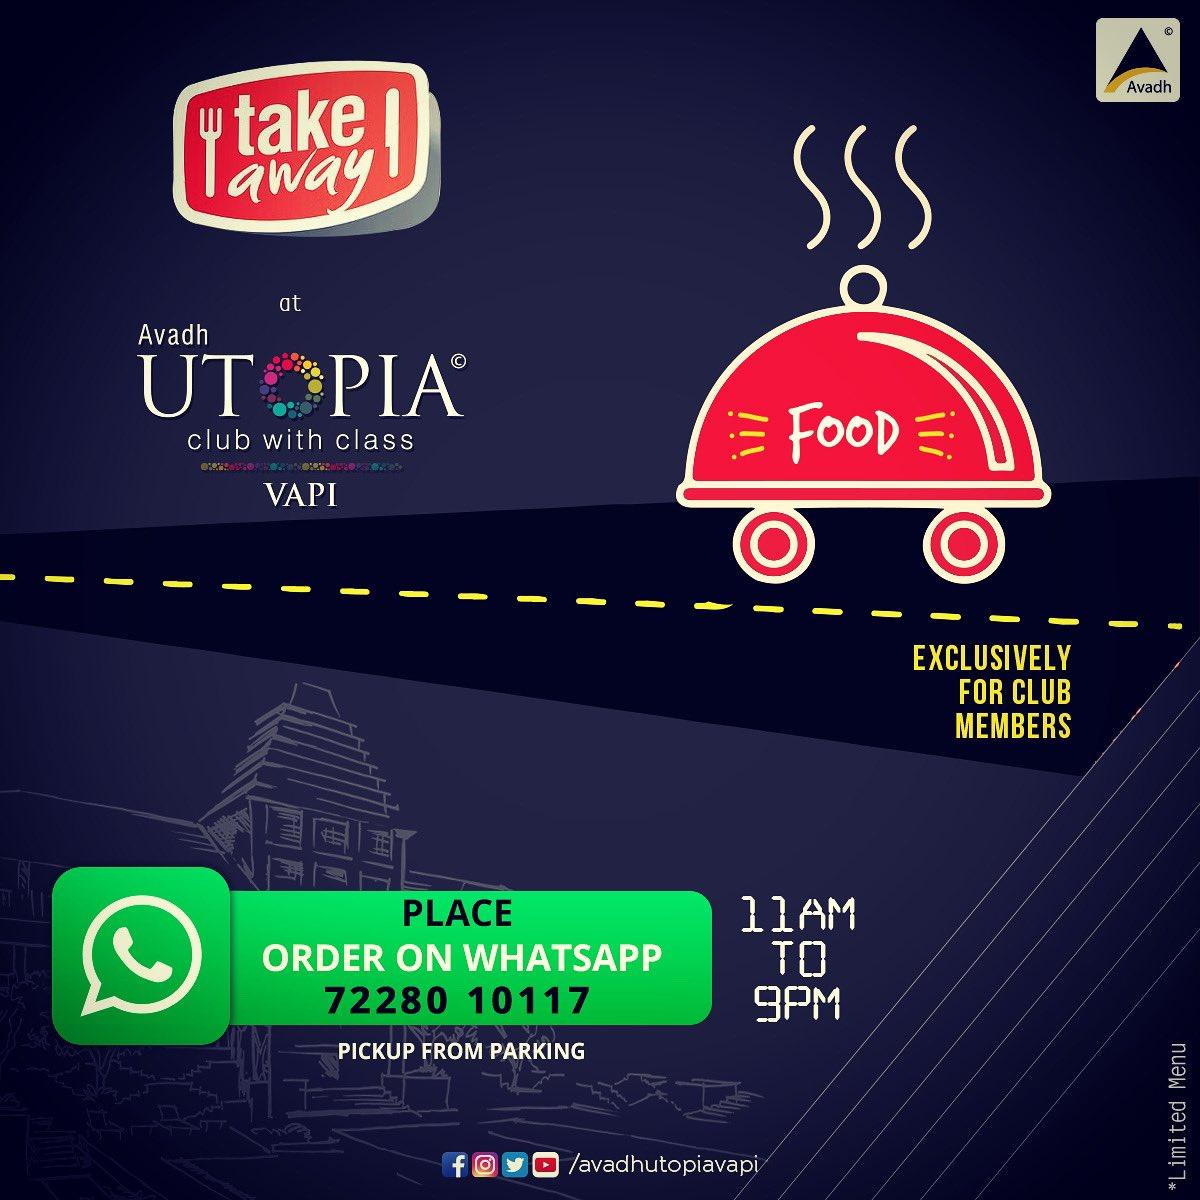 #drivethru #avadhutopia #takeaway #food #vapi #exclusive #clubmembers #utopia #utopian #proudtobeutopian